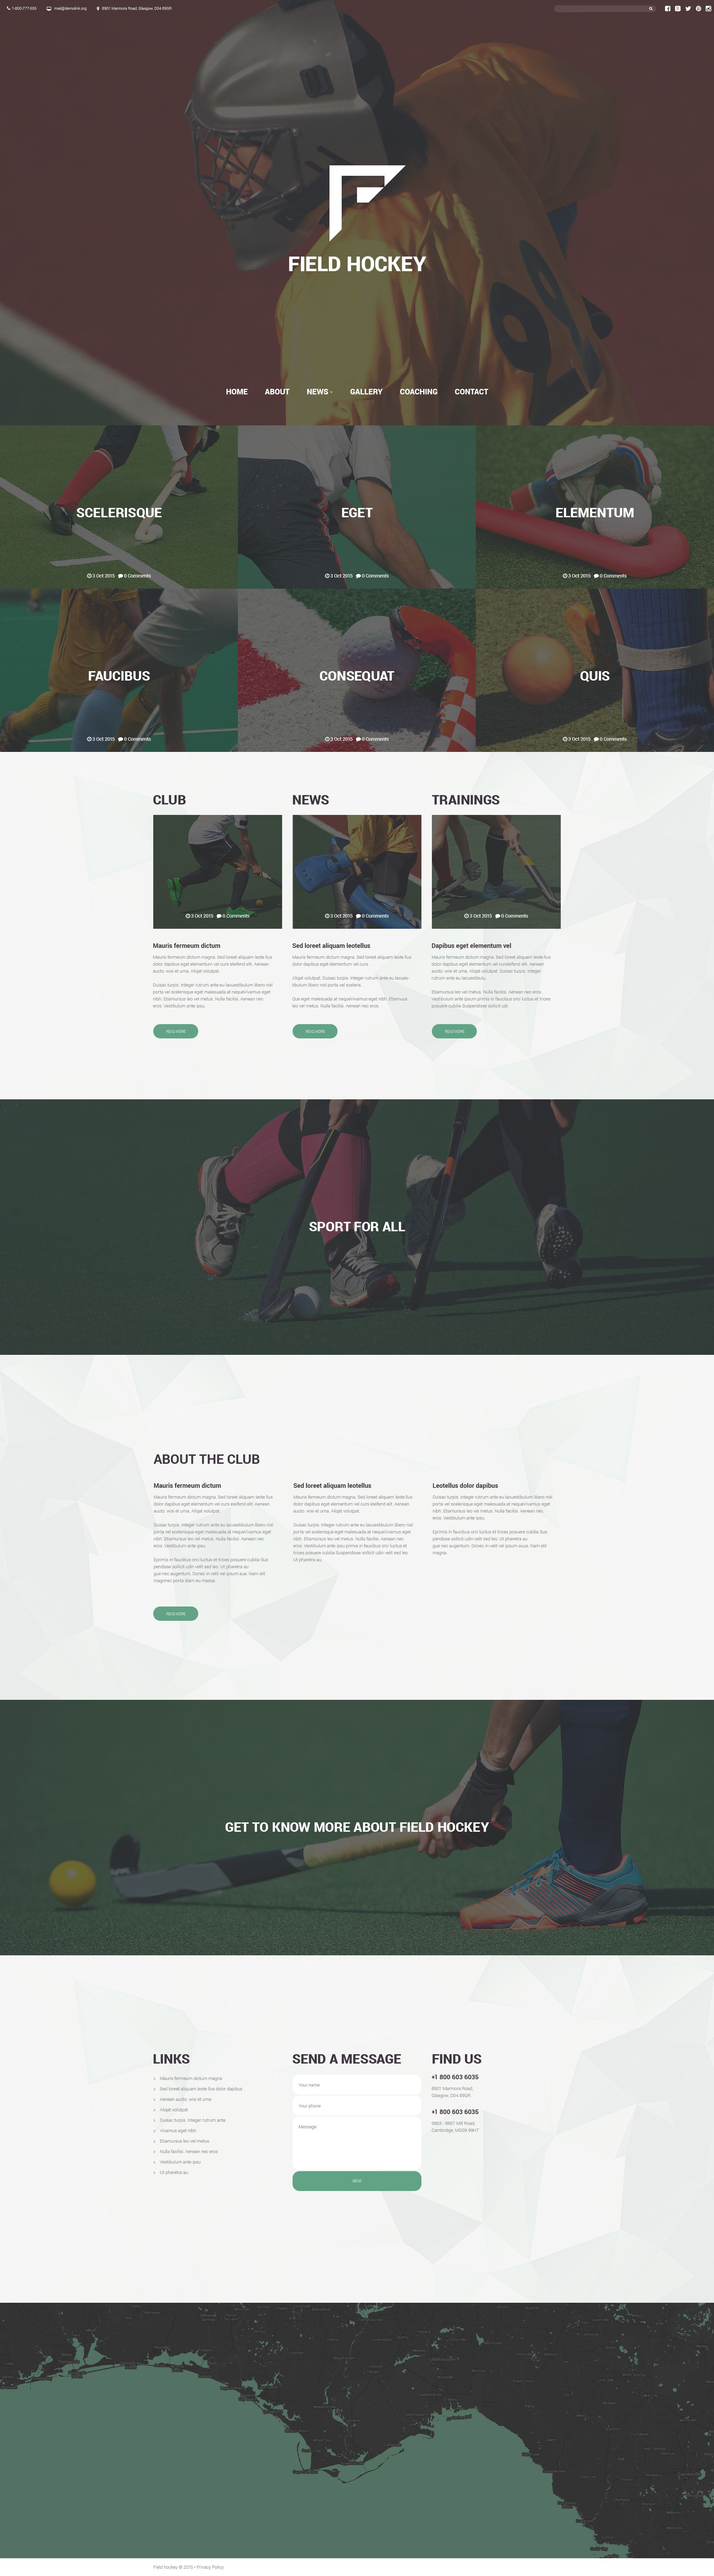 Field Hockey Club Website Template